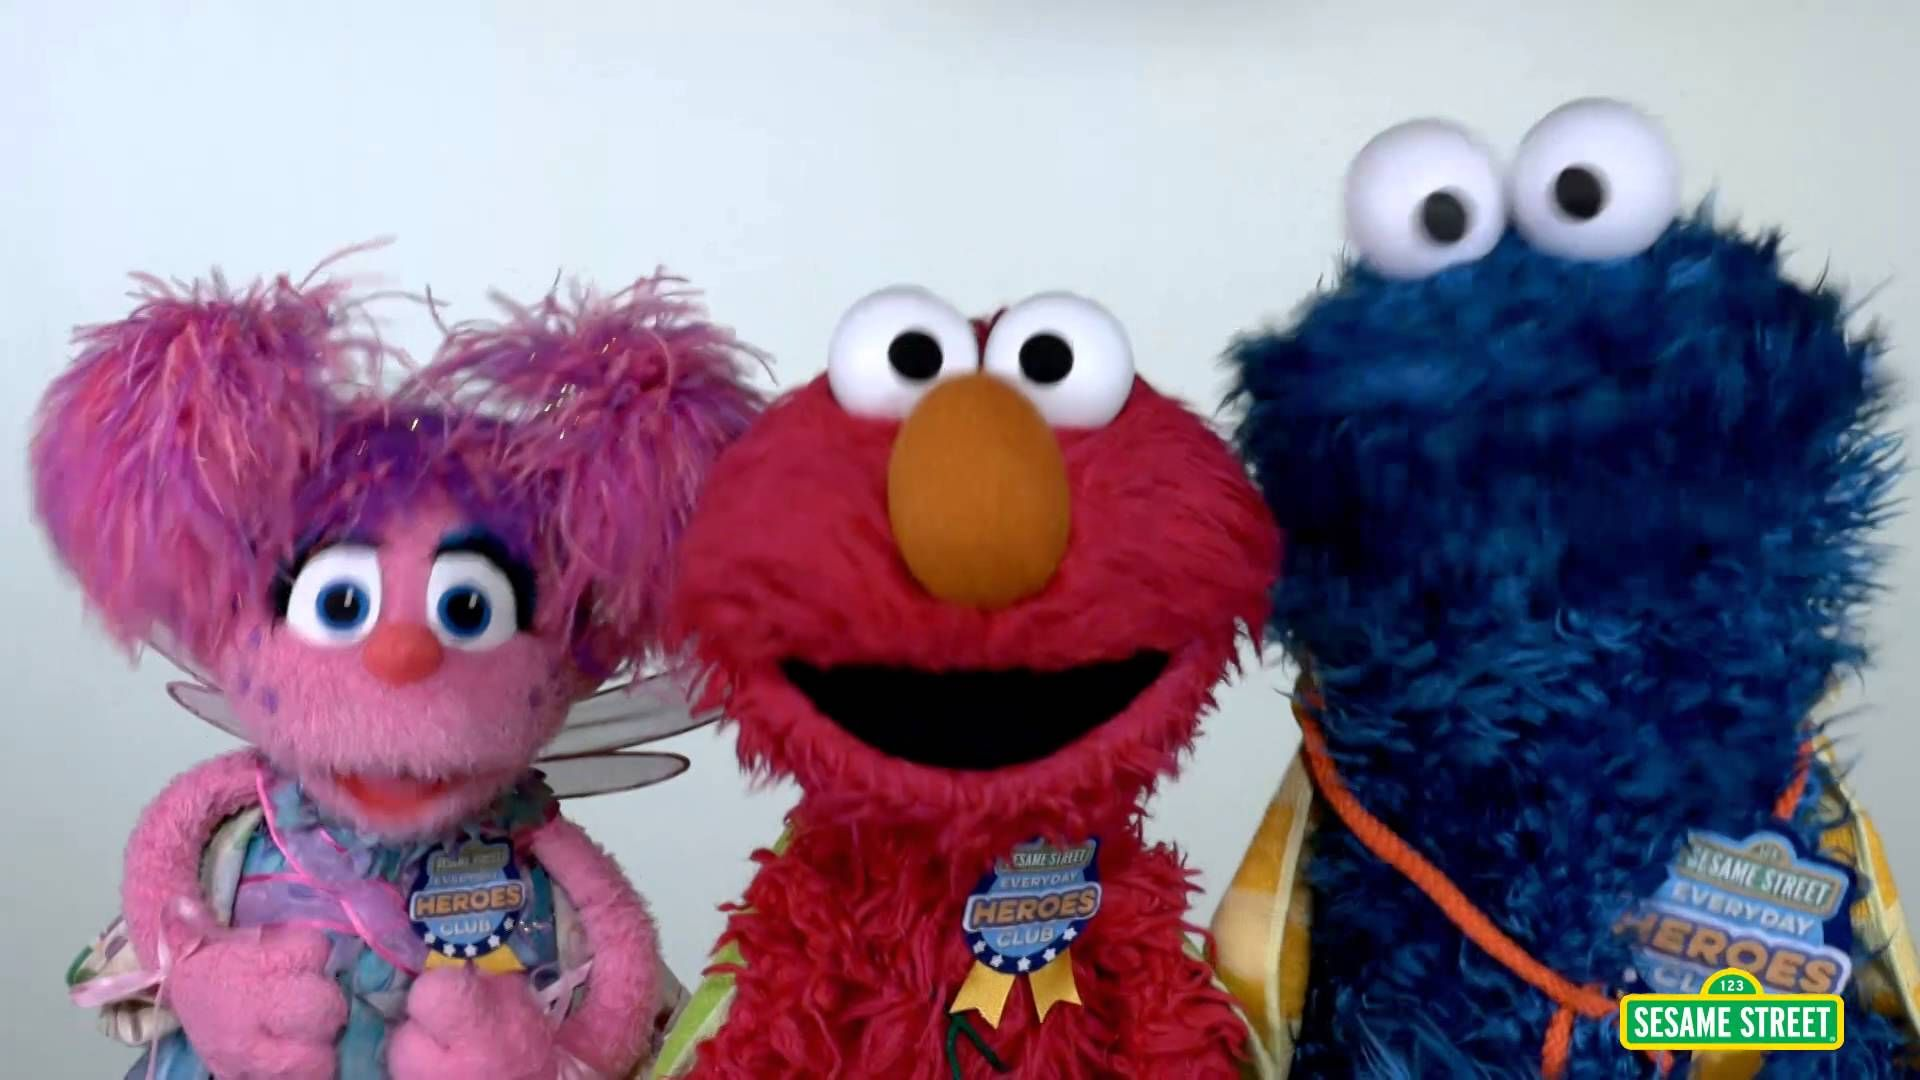 Sesame Street Keep Spreading Kindness